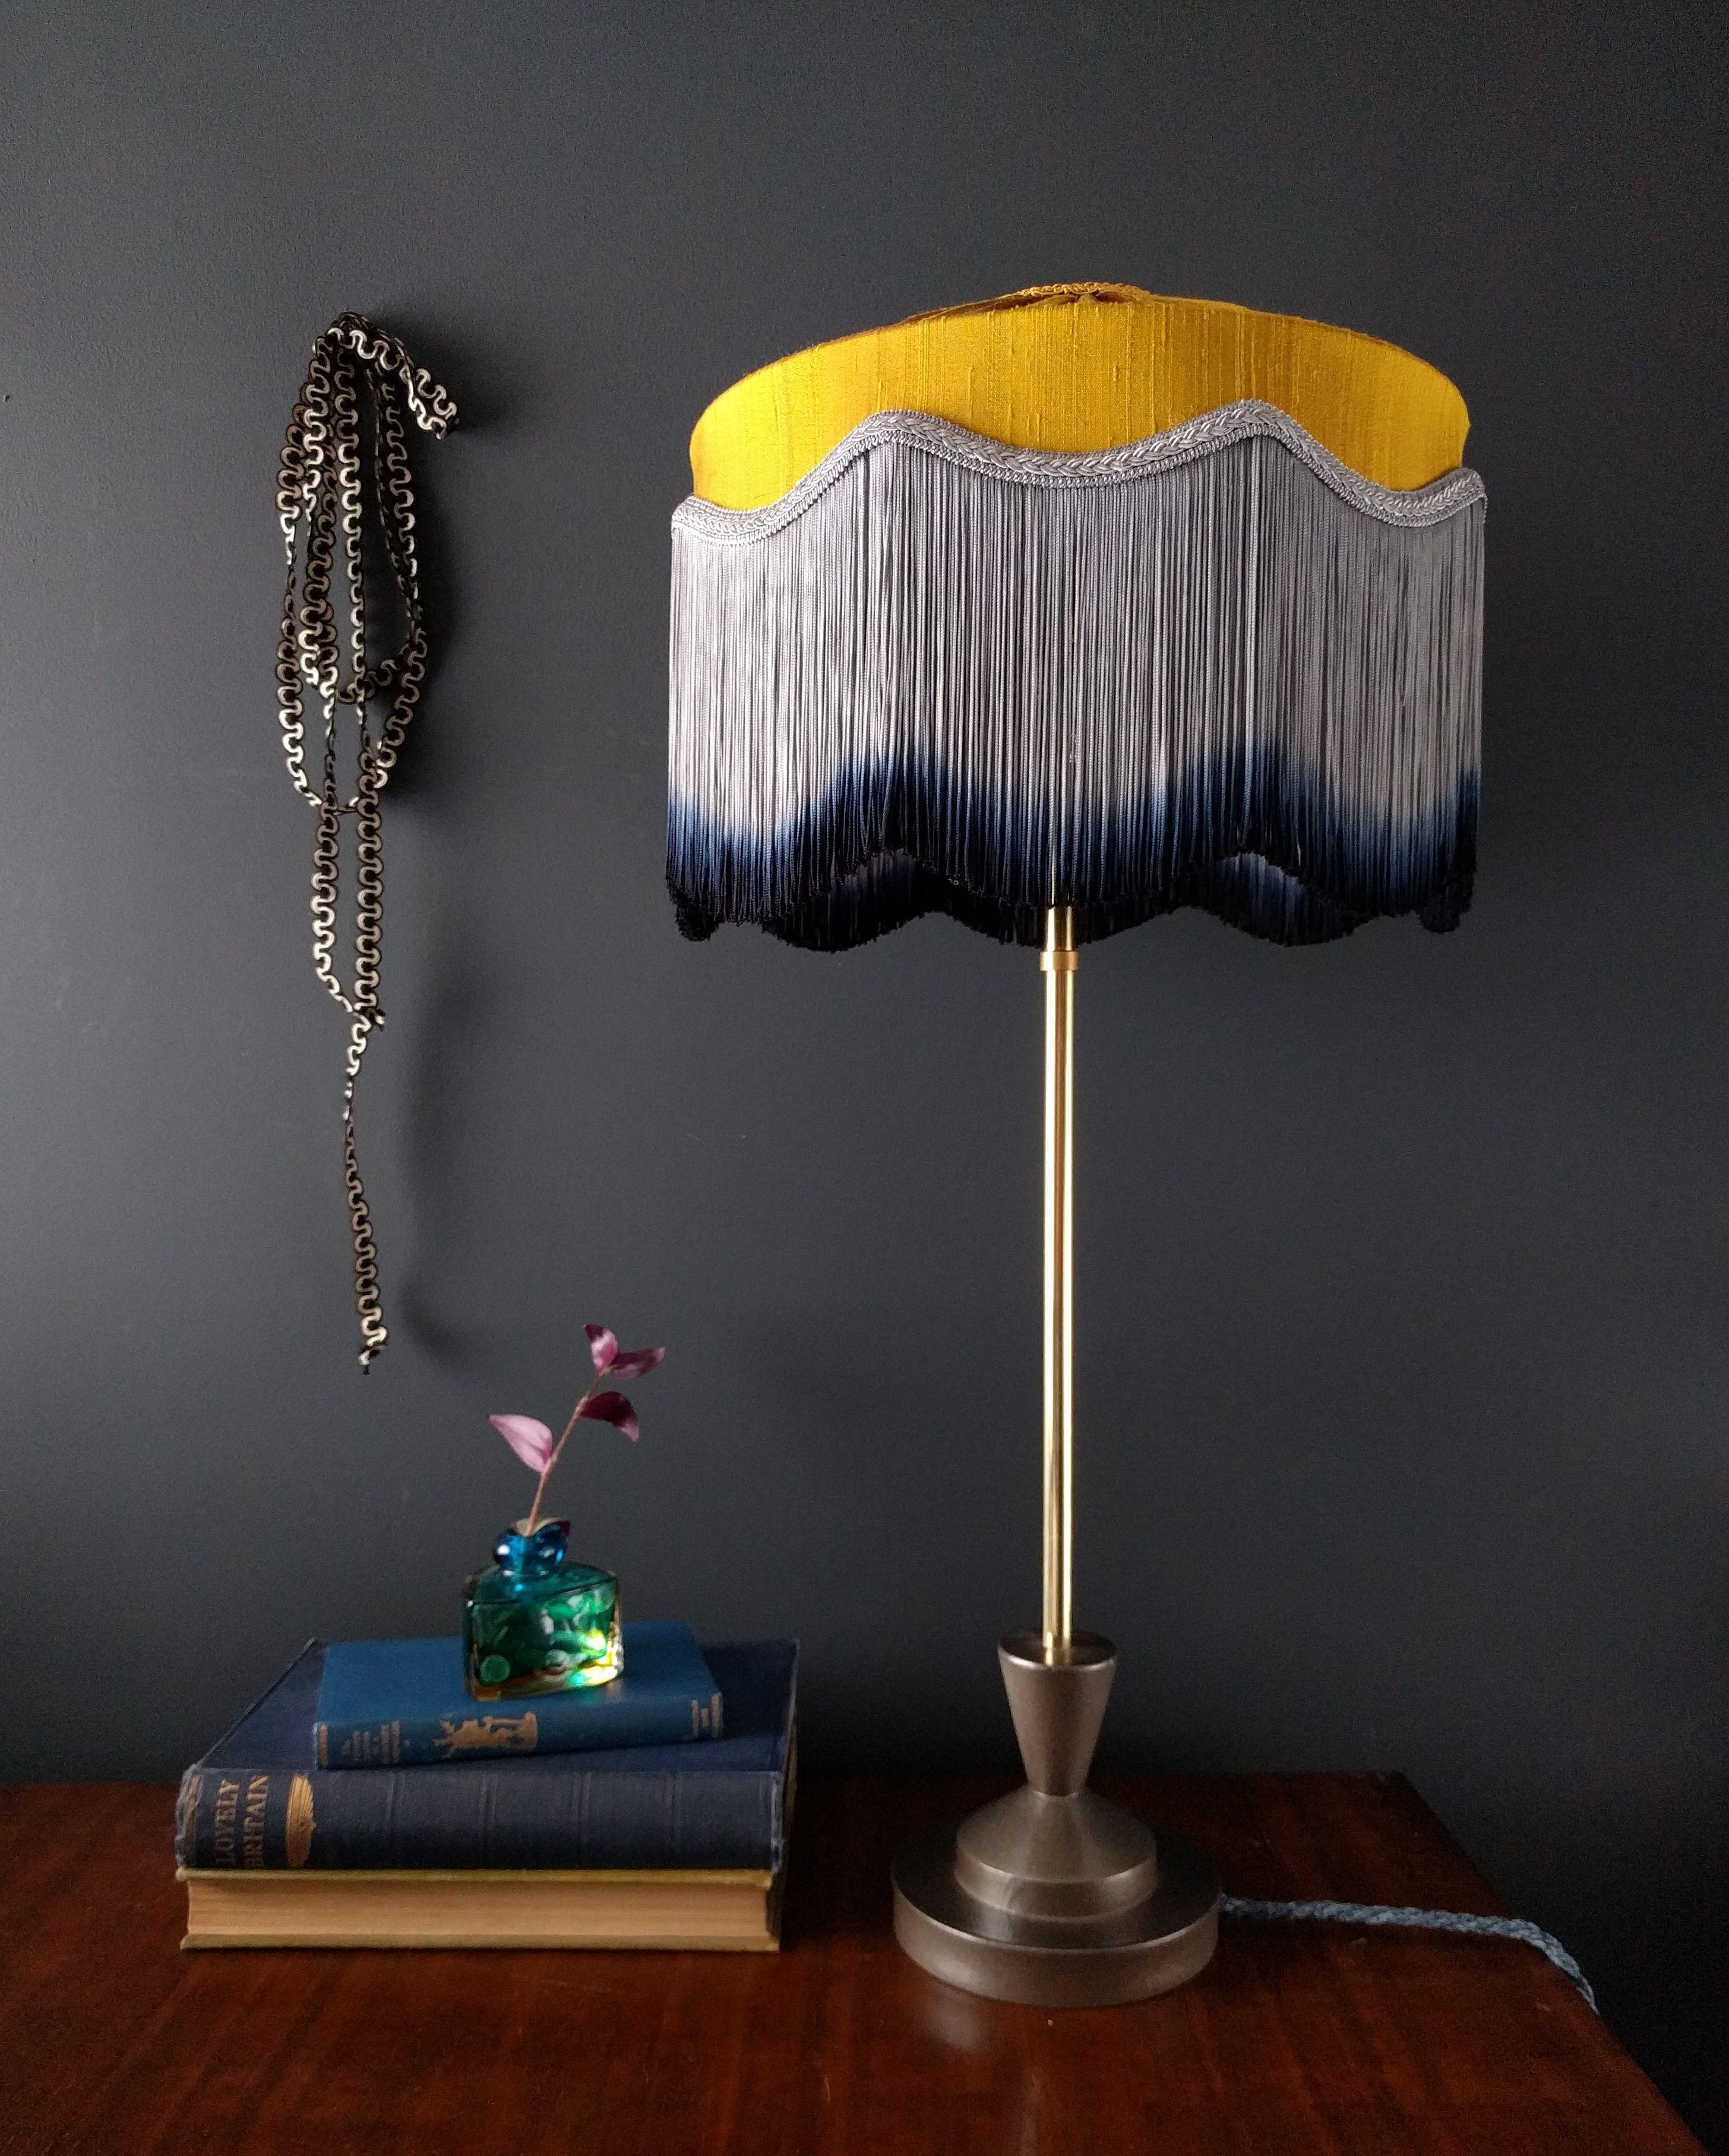 Image Result For T I F F A N Y Tassel Lampshade Lamp Shades Lampshades Turquoise Lamp Shade